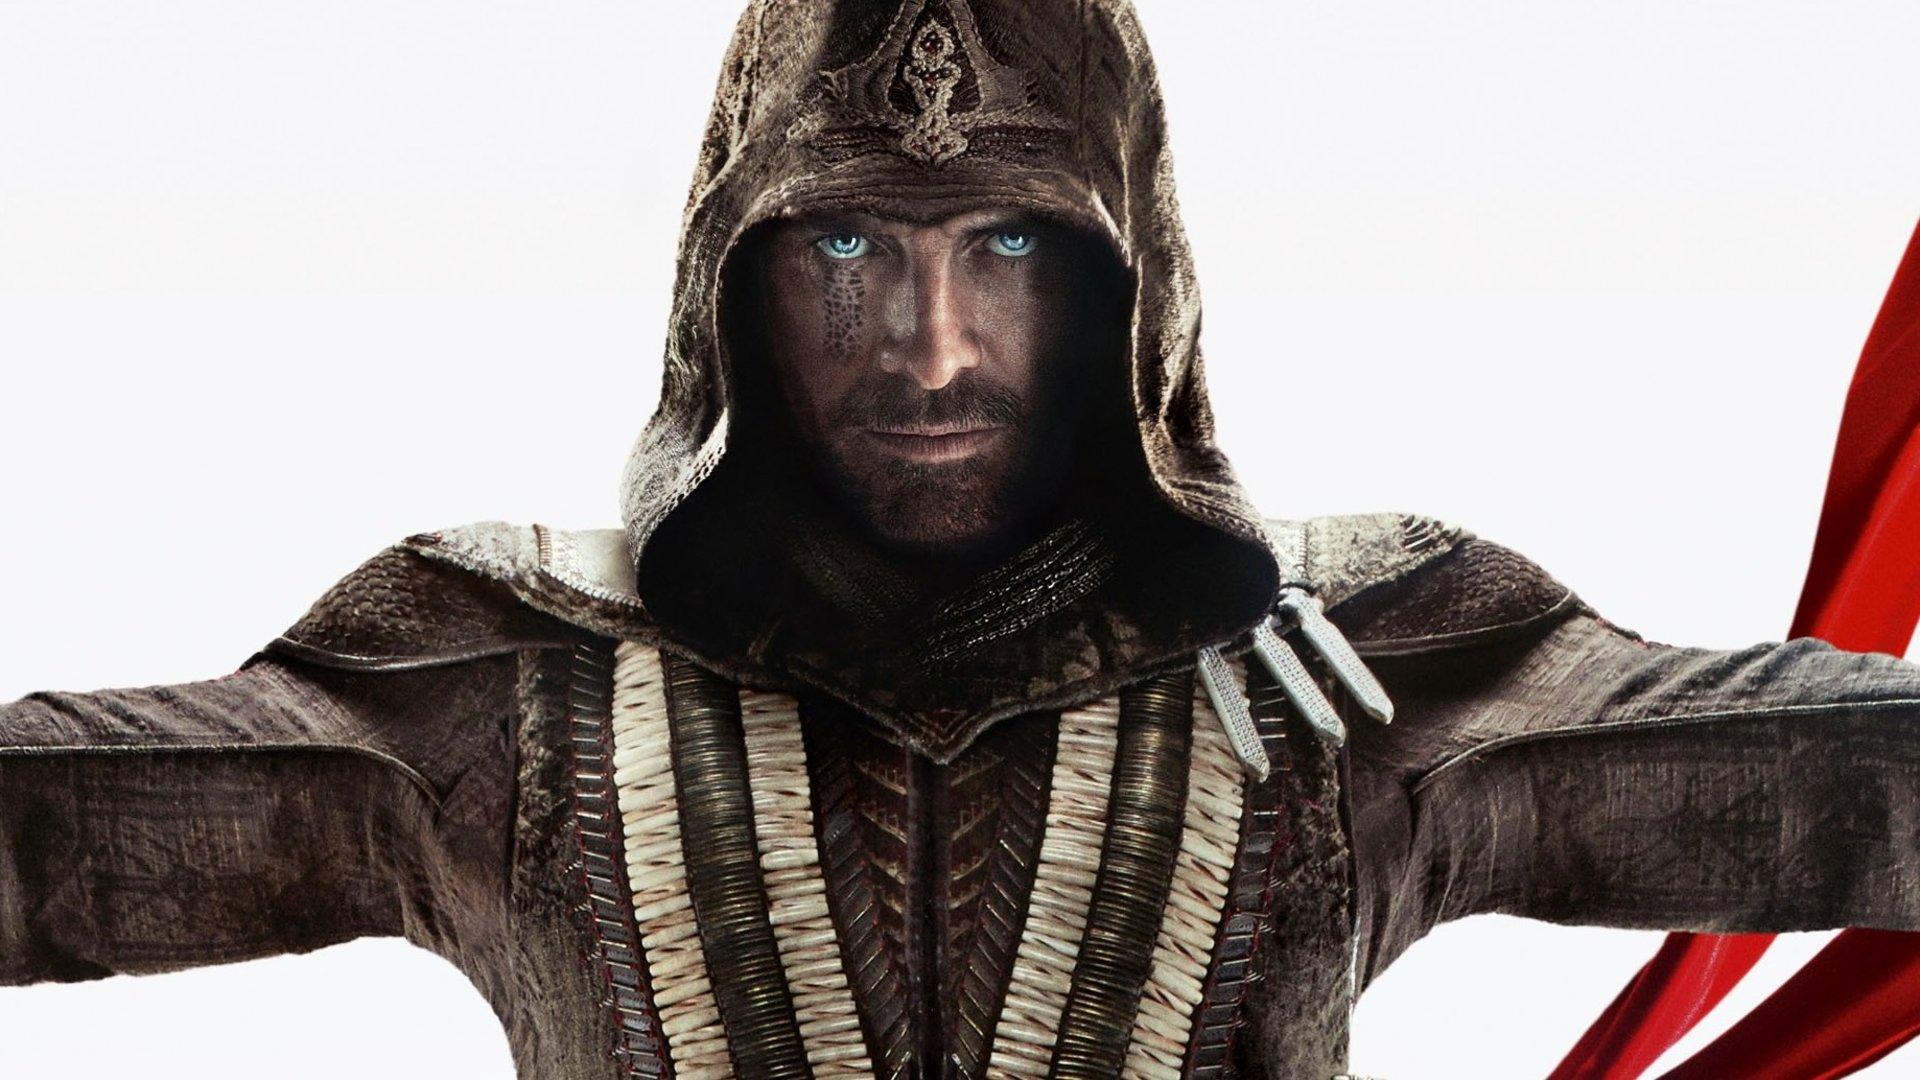 "Assassin's Creed 20"" Wird der Film noch fortgesetzt · KINO.de"